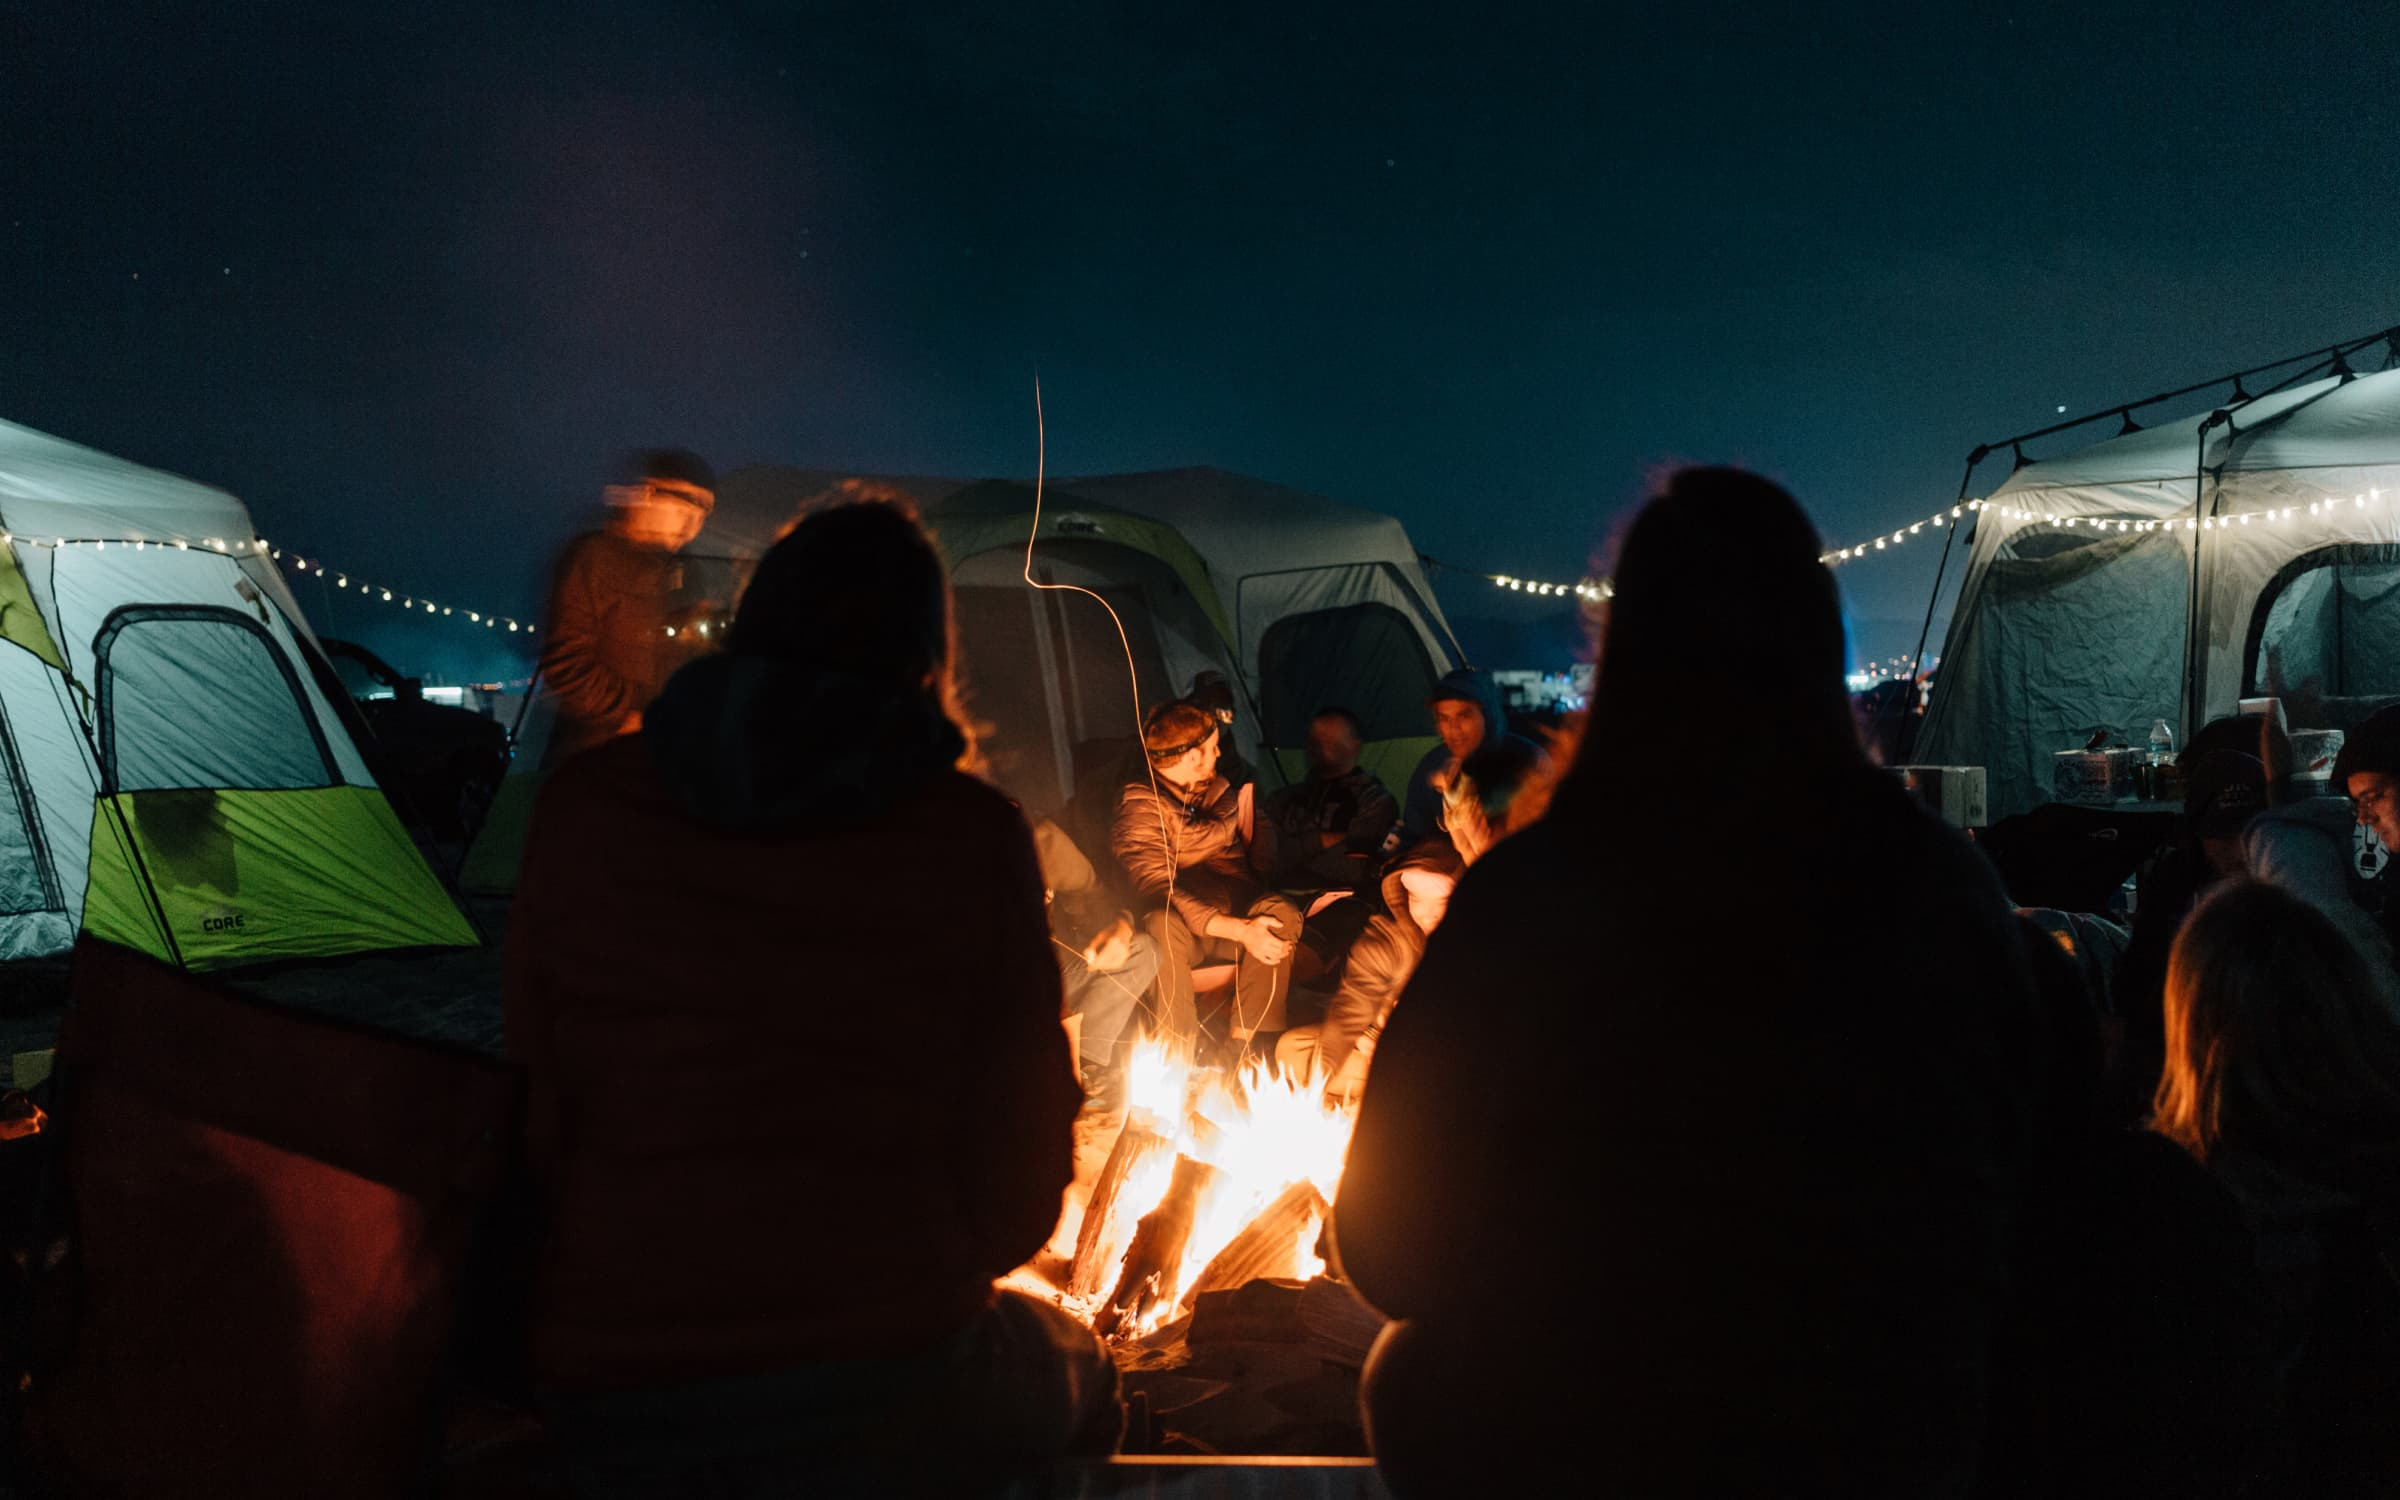 Pismo beach campfire